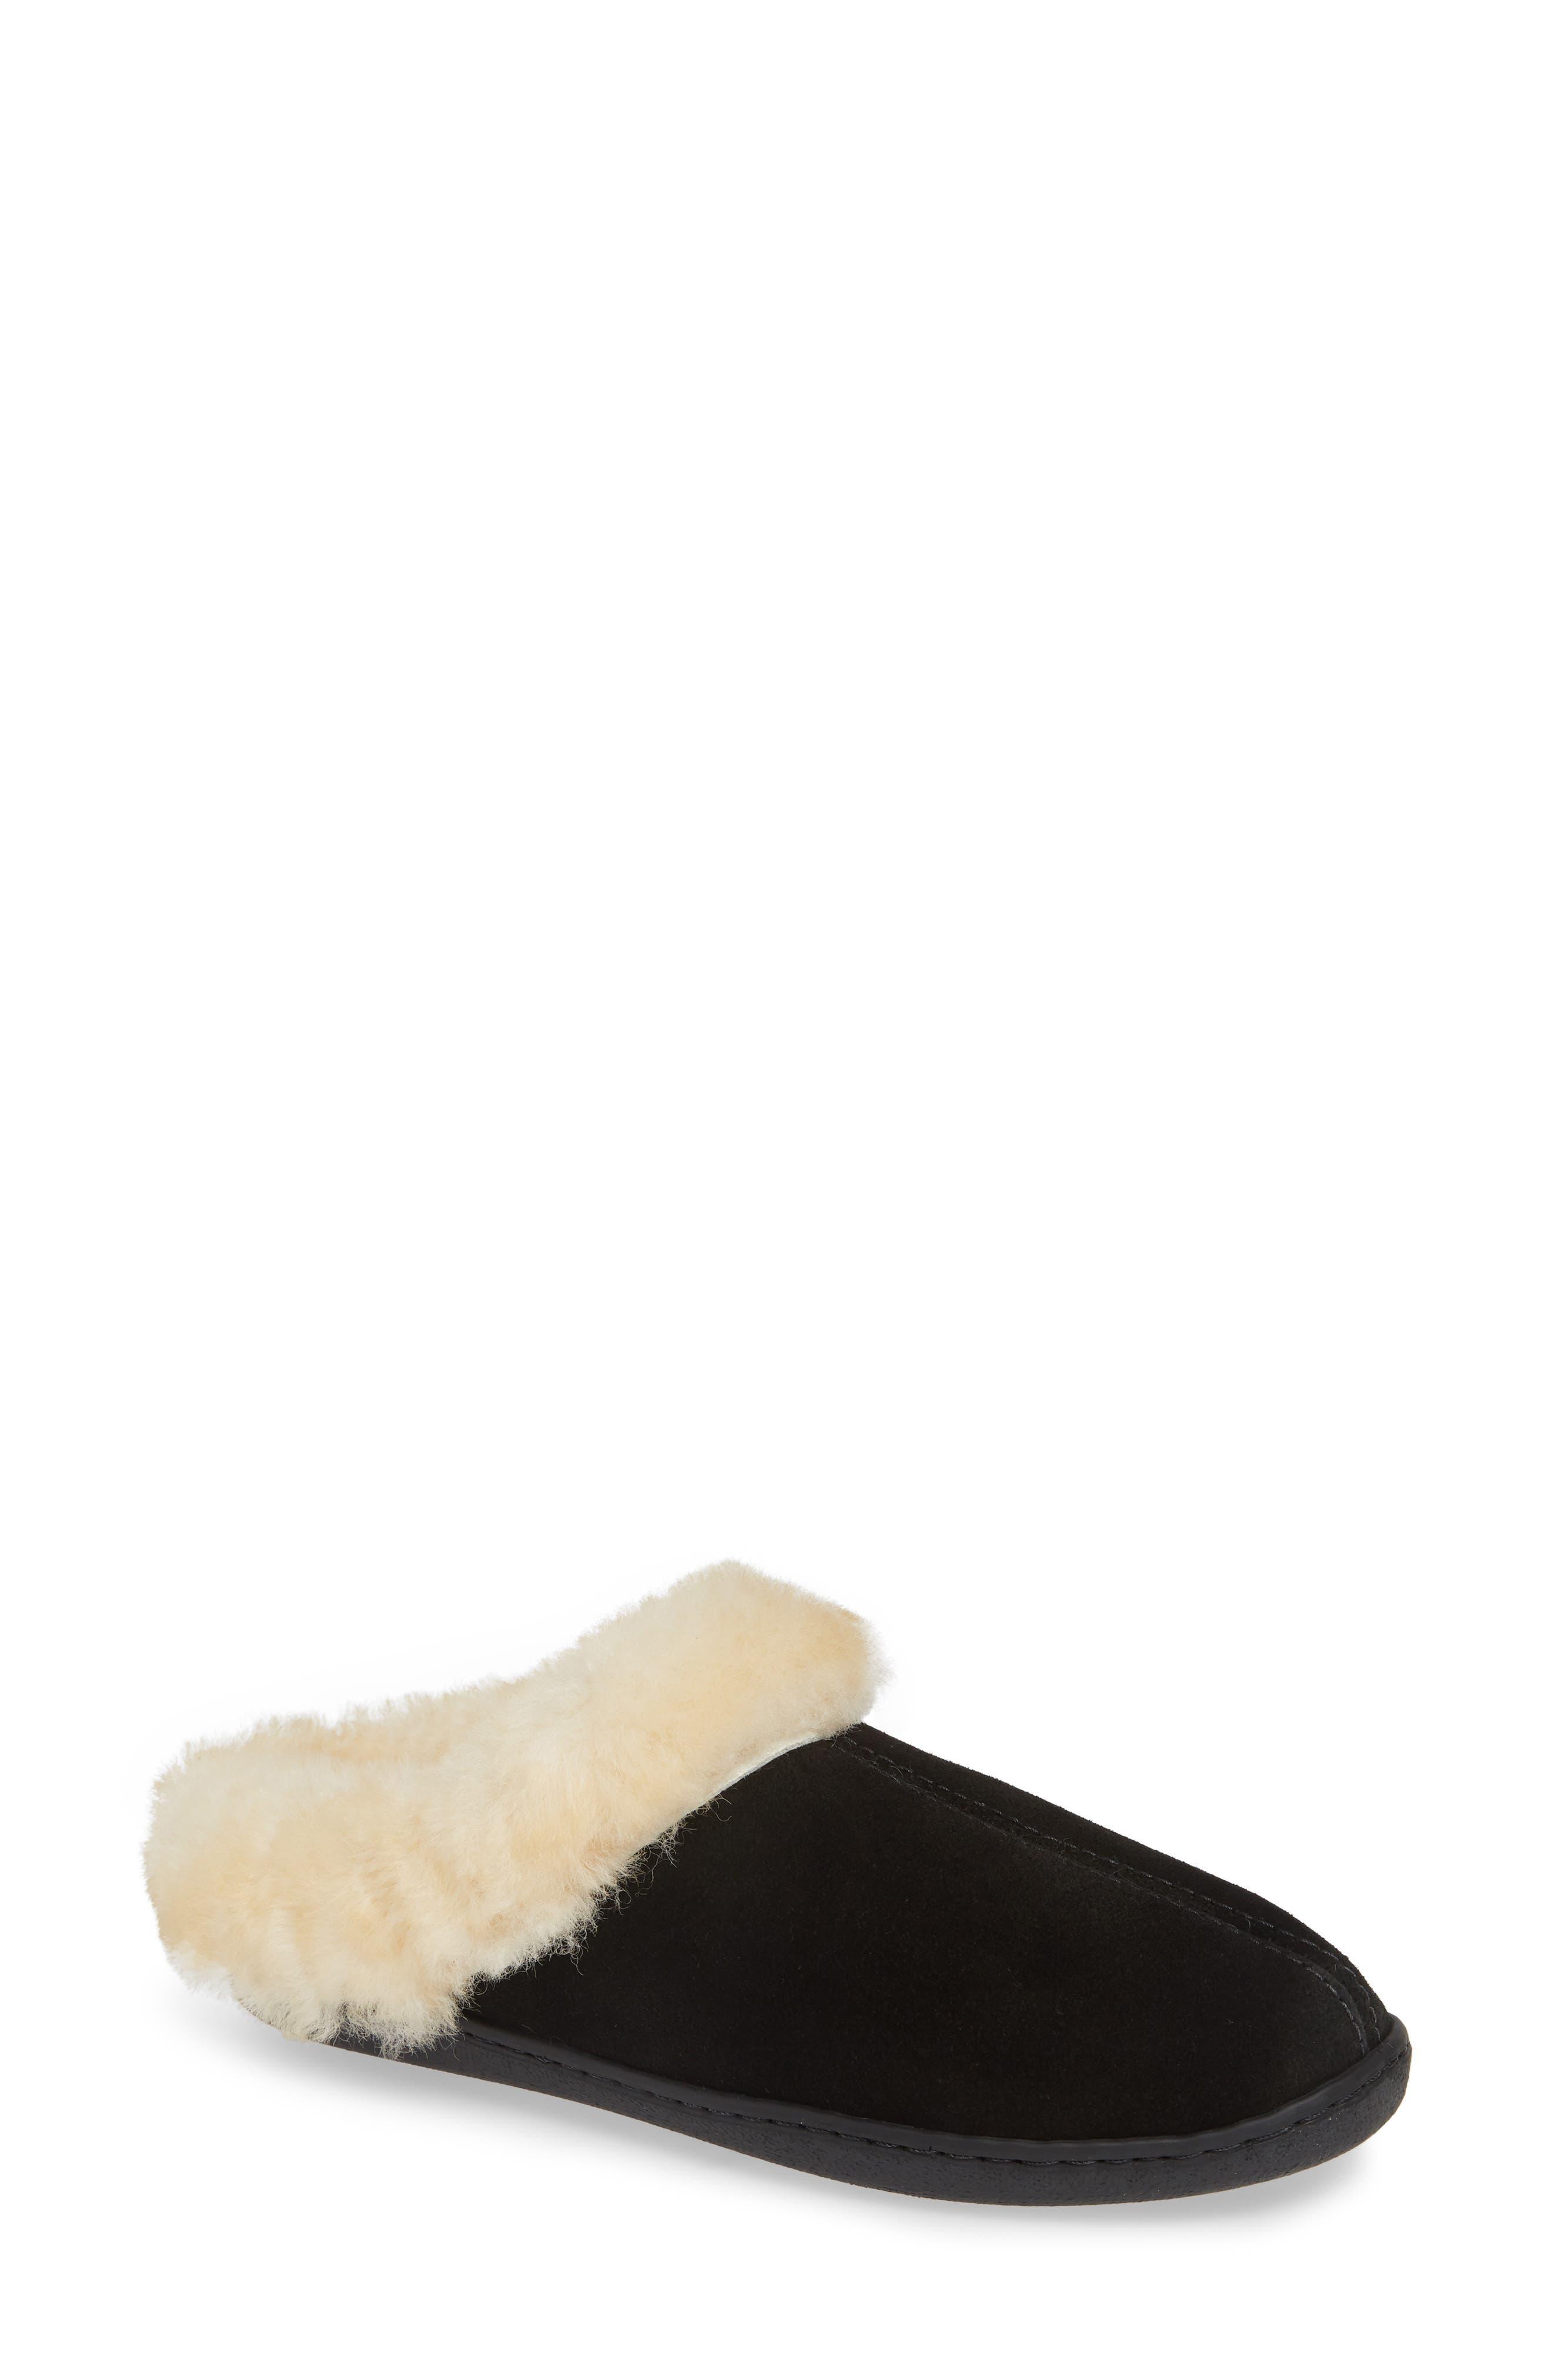 SheepskinMule Slipper,                             Main thumbnail 1, color,                             BLACK SUEDE